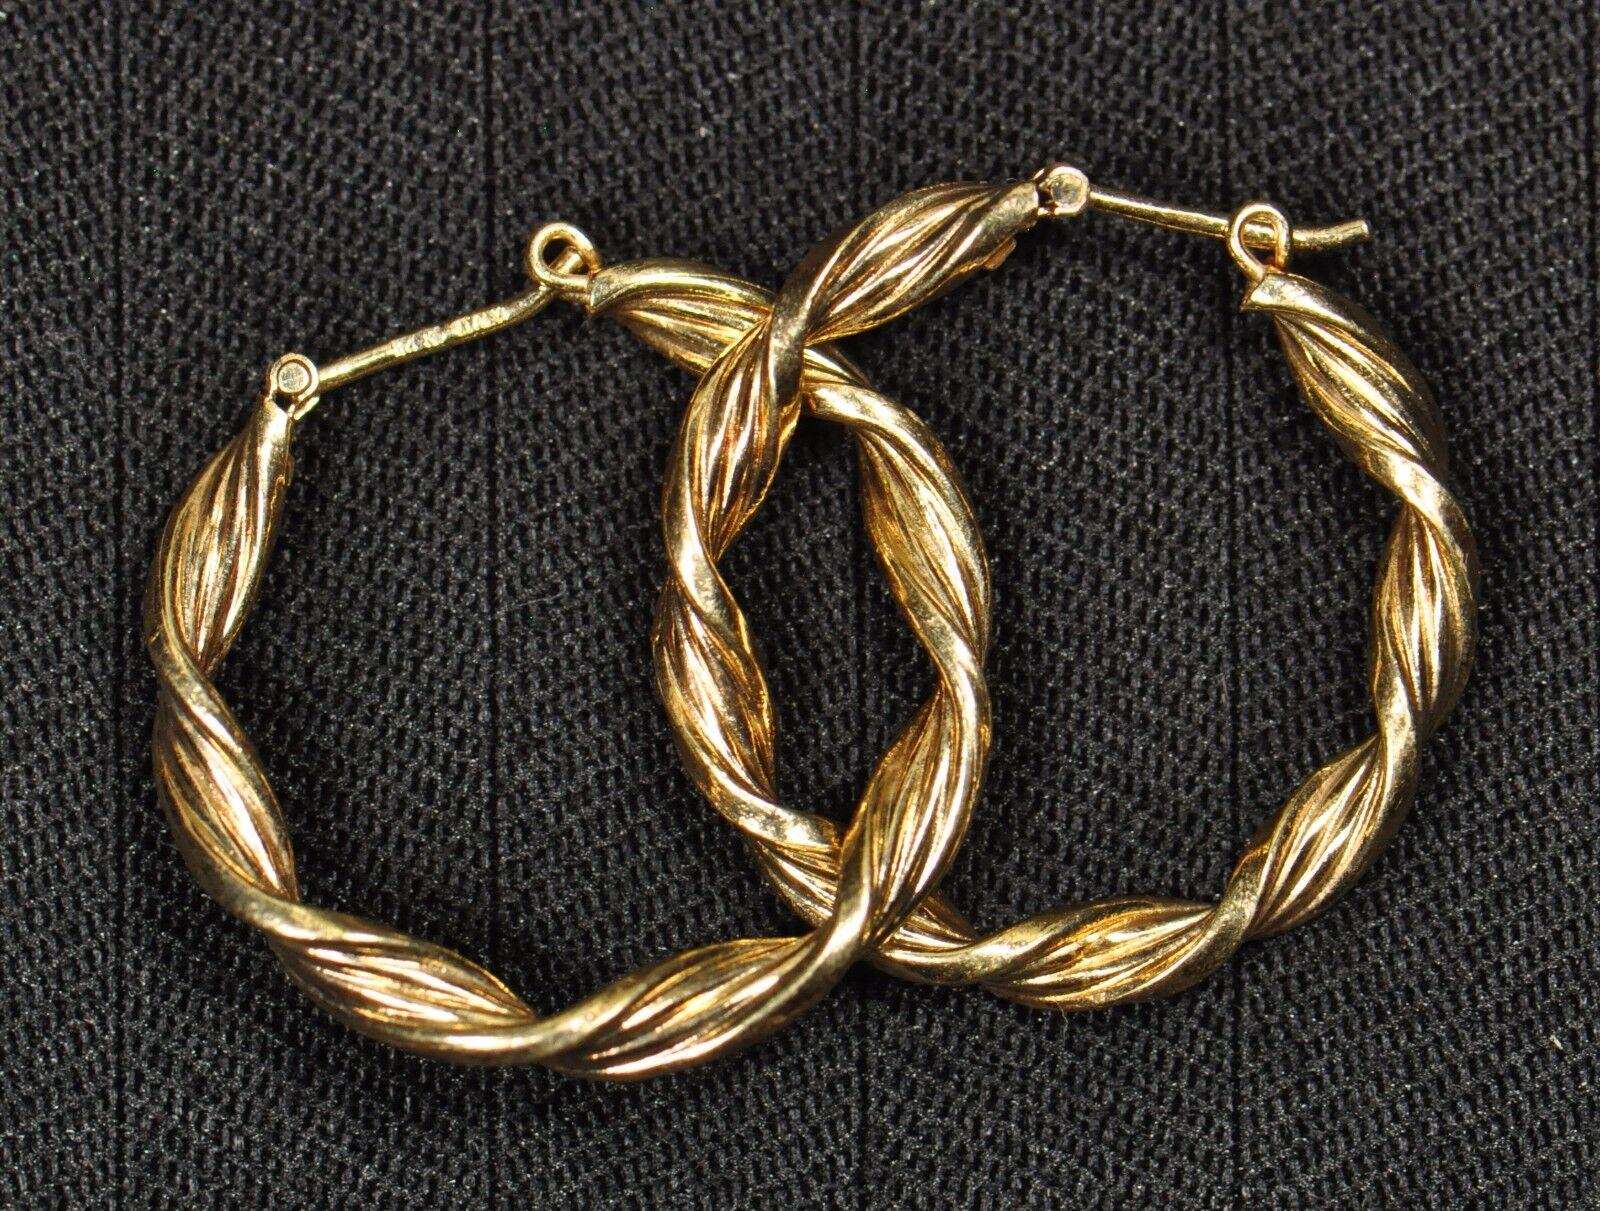 14k Yellow gold Hoop Earrings - Gently Used - J-167A